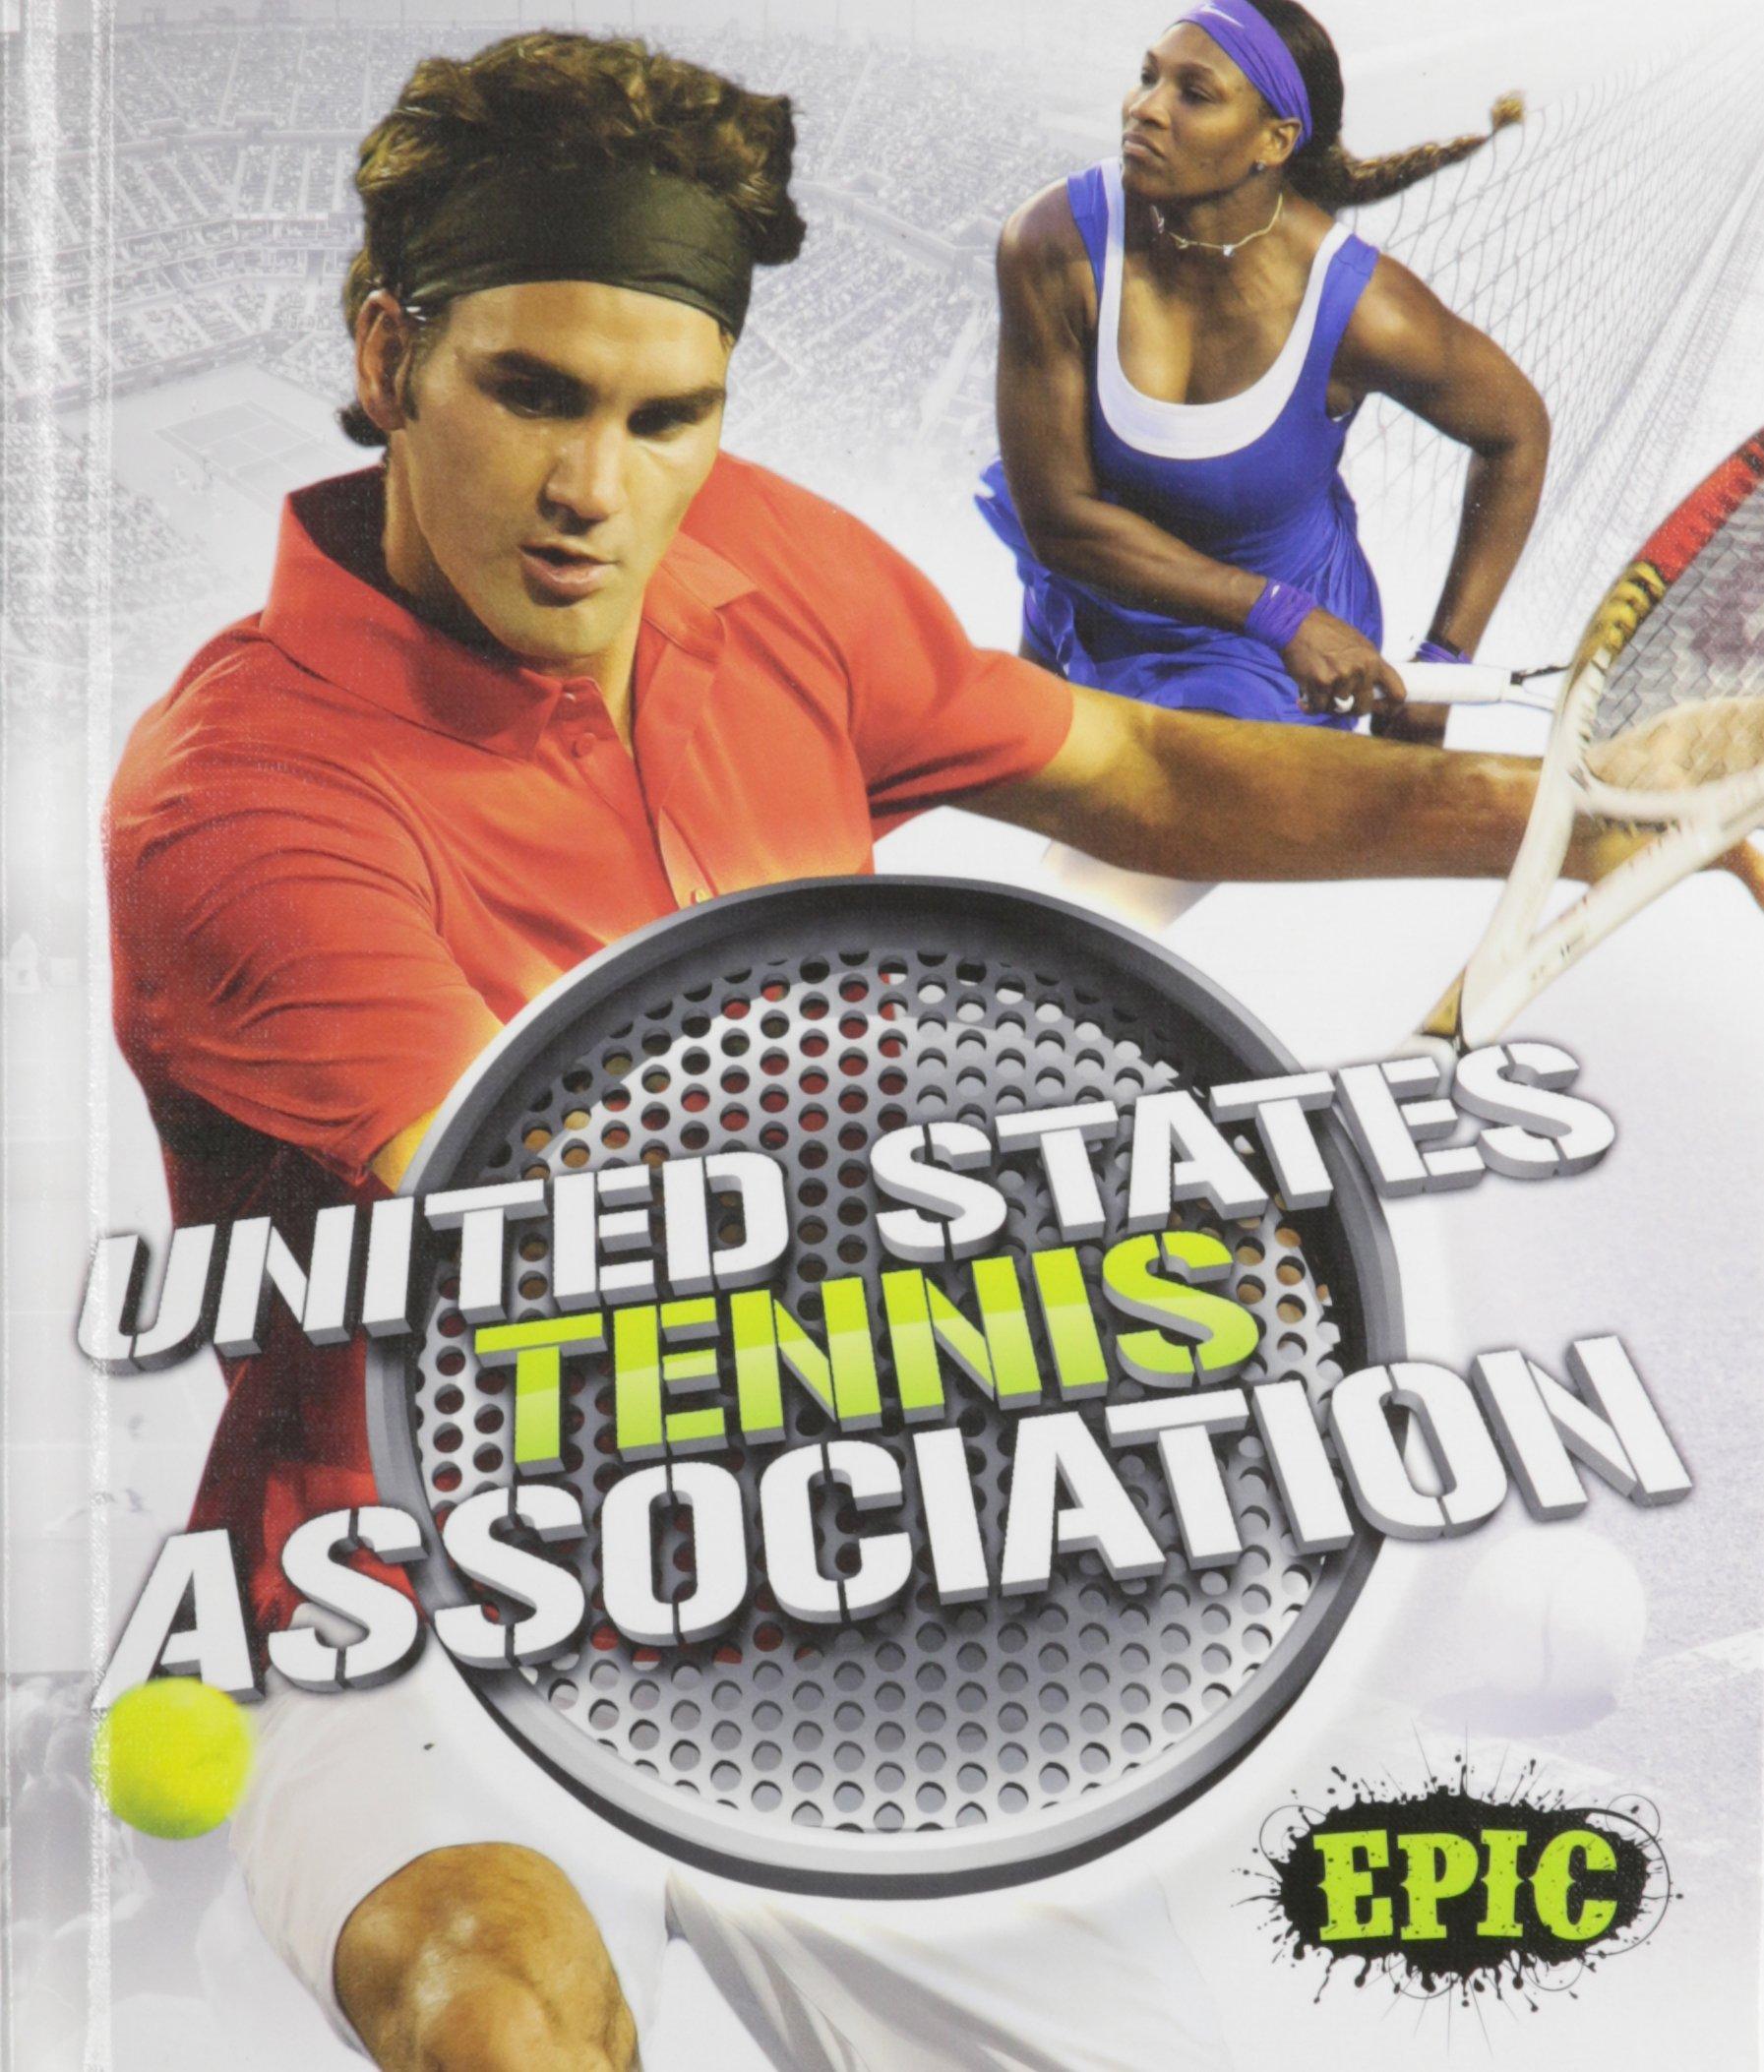 United States Tennis Association (Major League Sports)